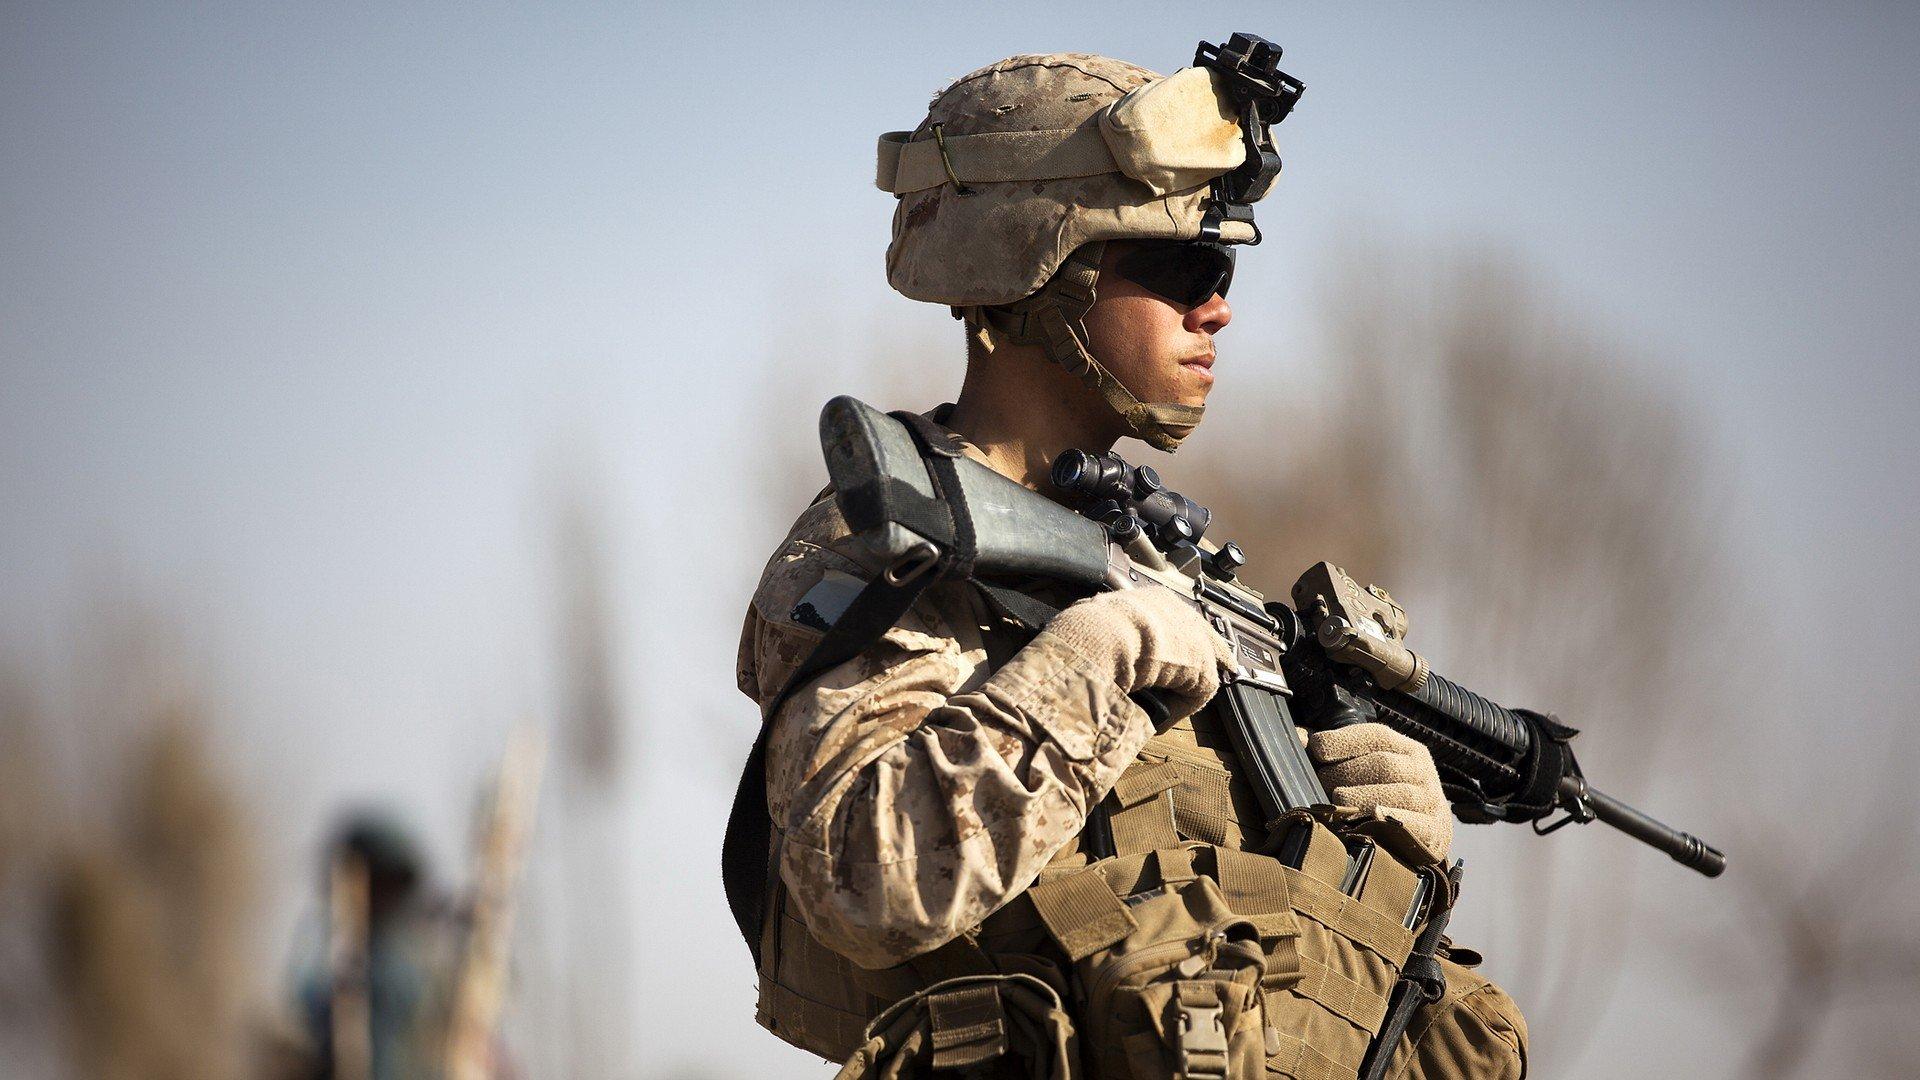 Soldiers war guns army Afghanistan US Marines Corps soldat ...